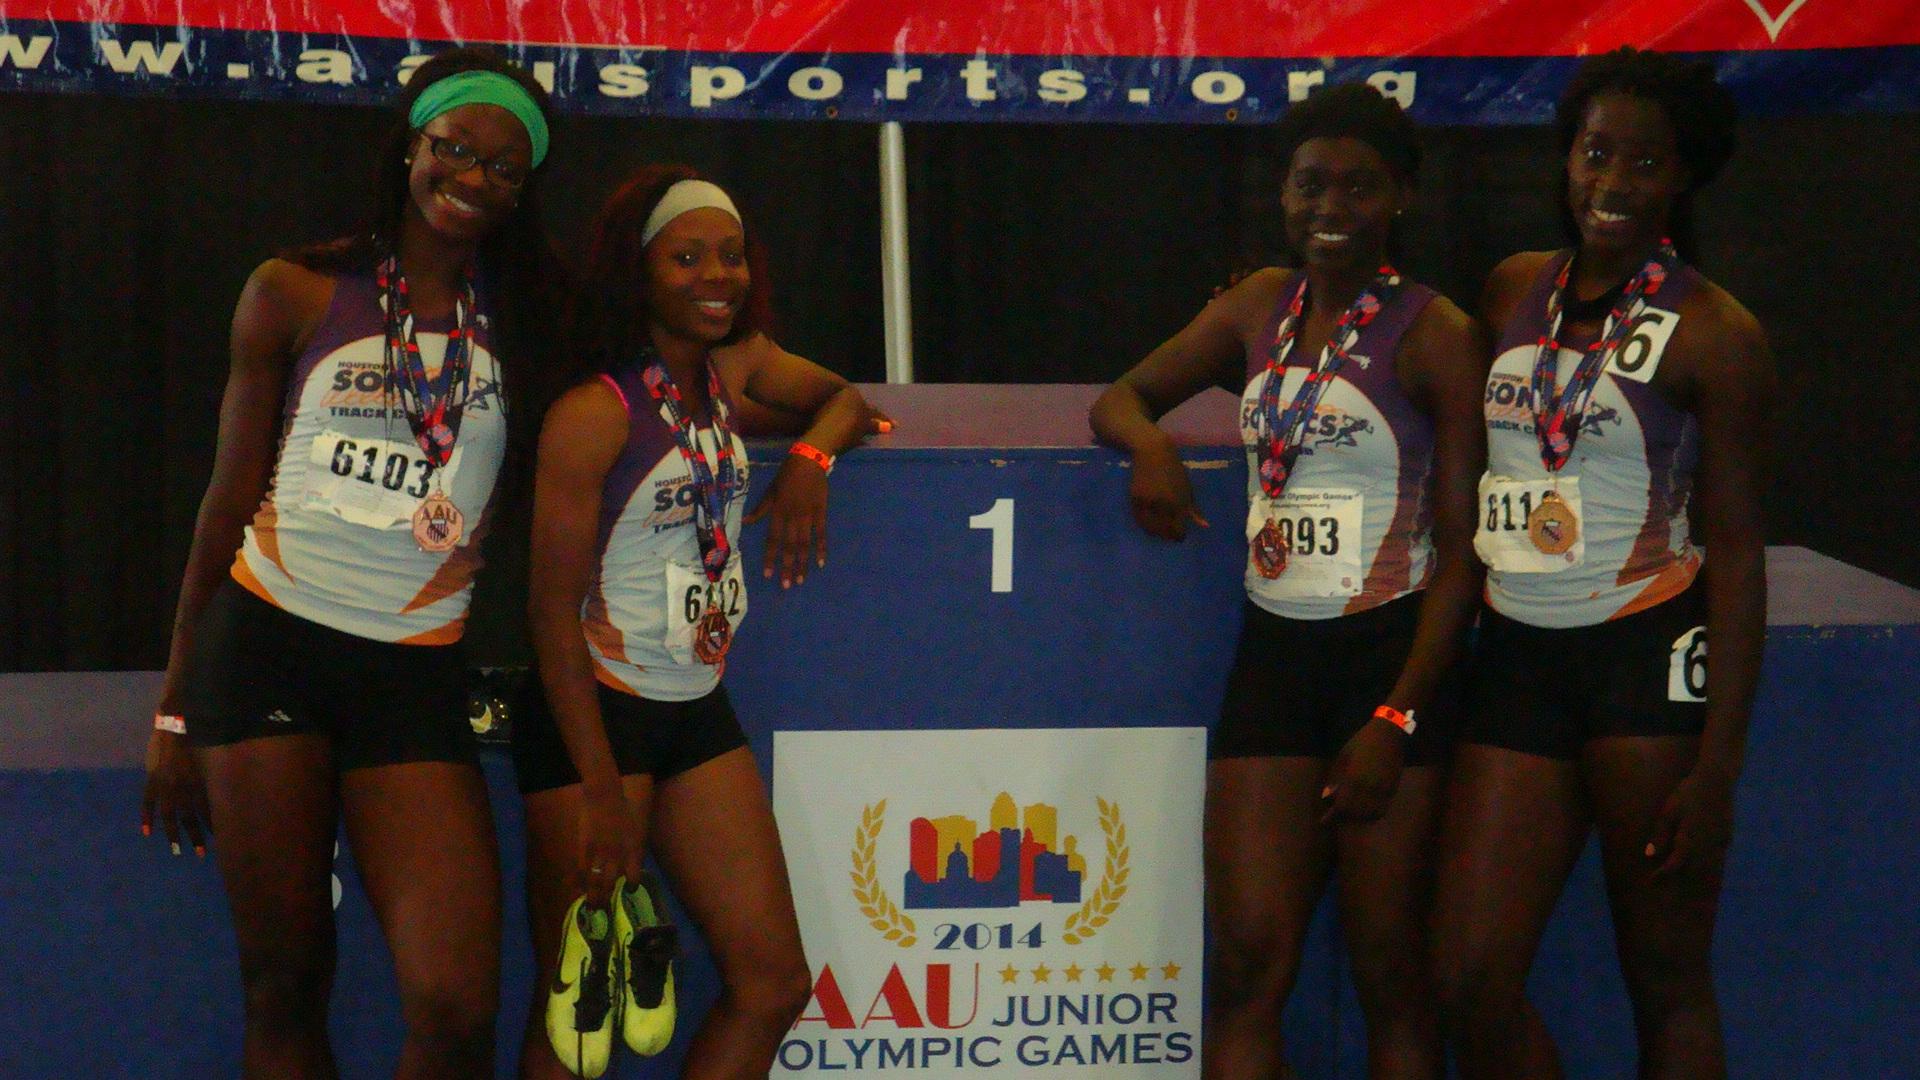 17-18 women 4x400 medalists